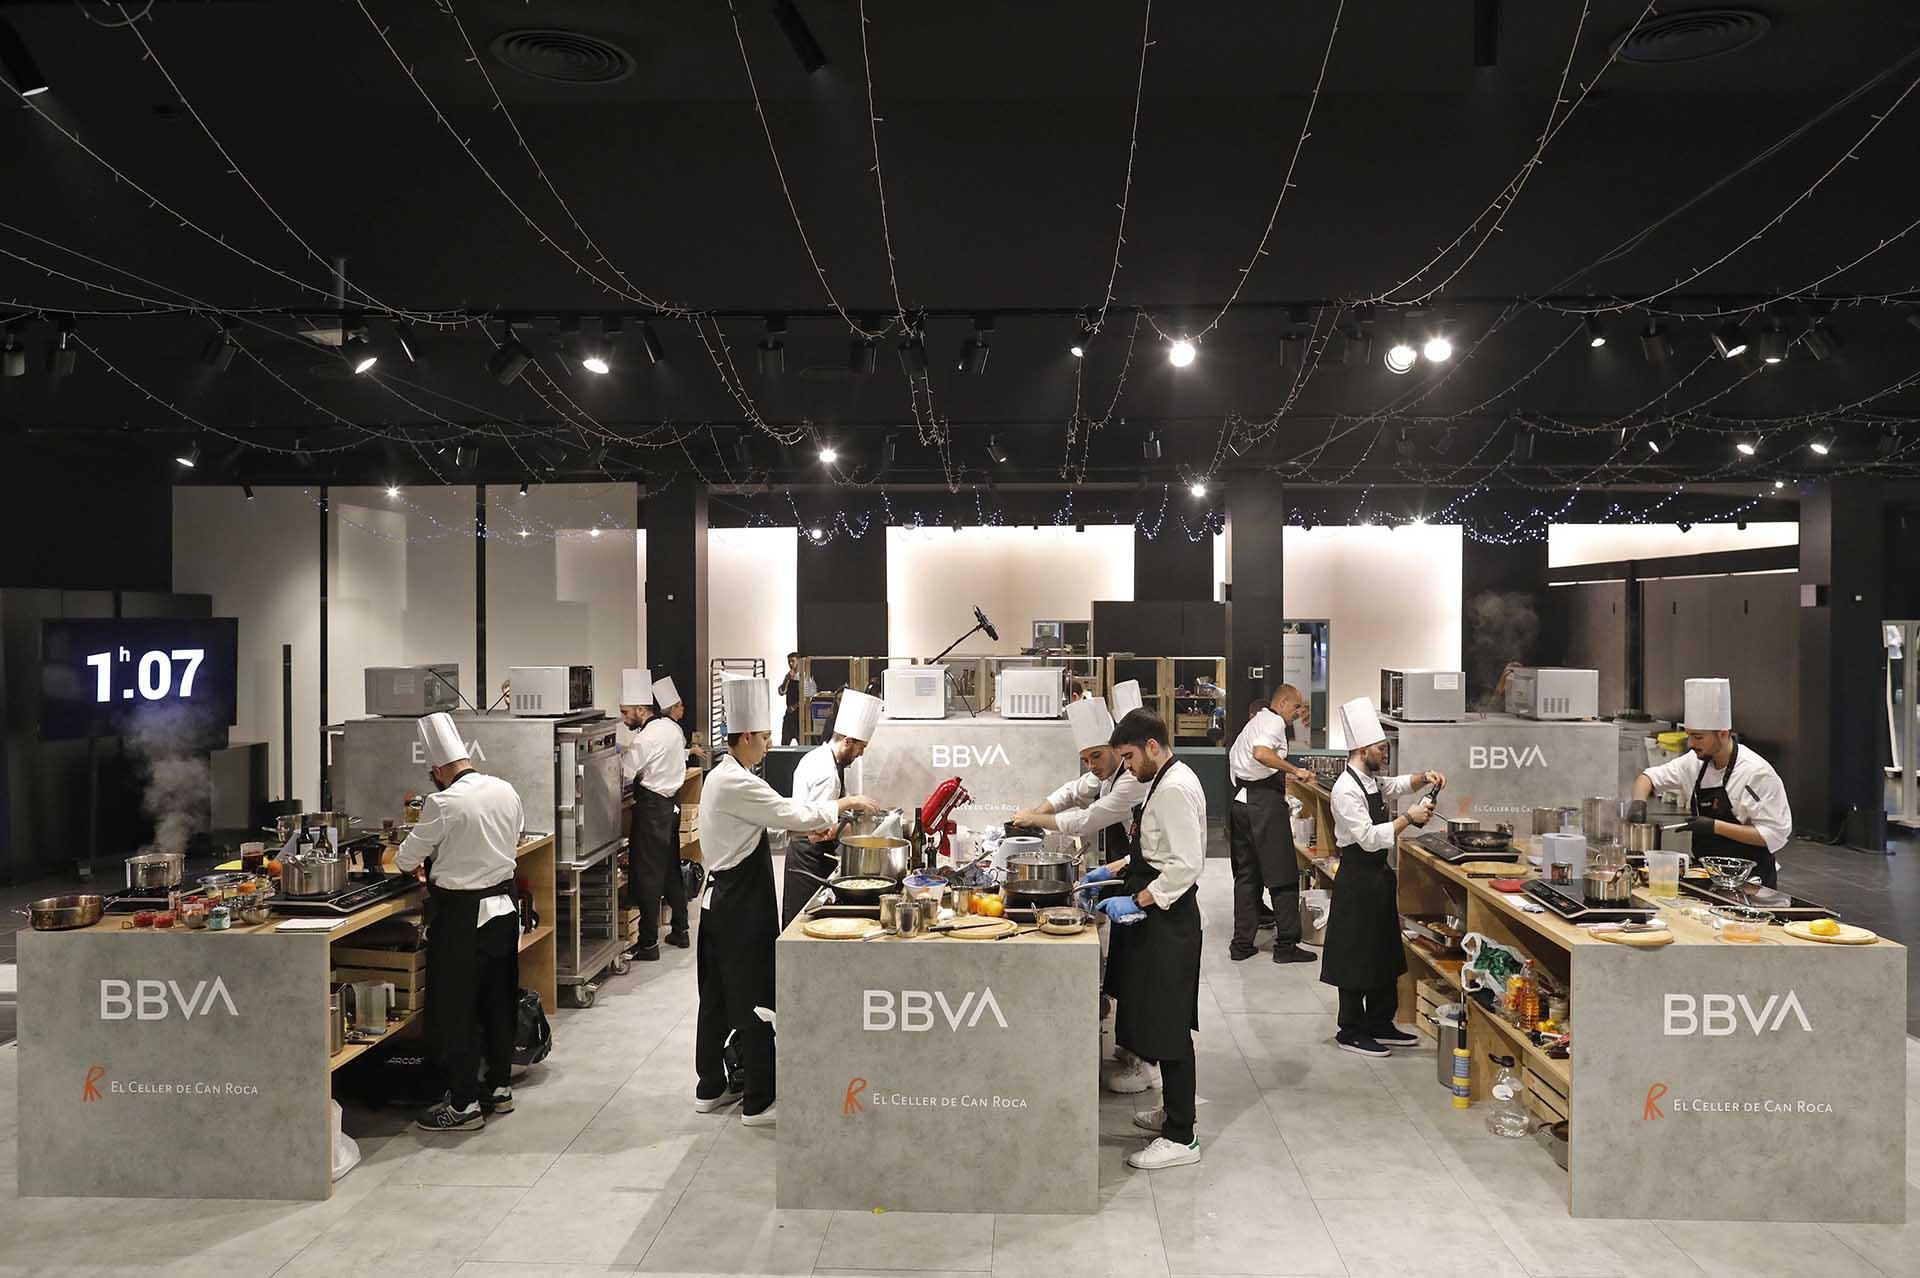 Event awards BBVA hospitality scholarships. Kitchen sets